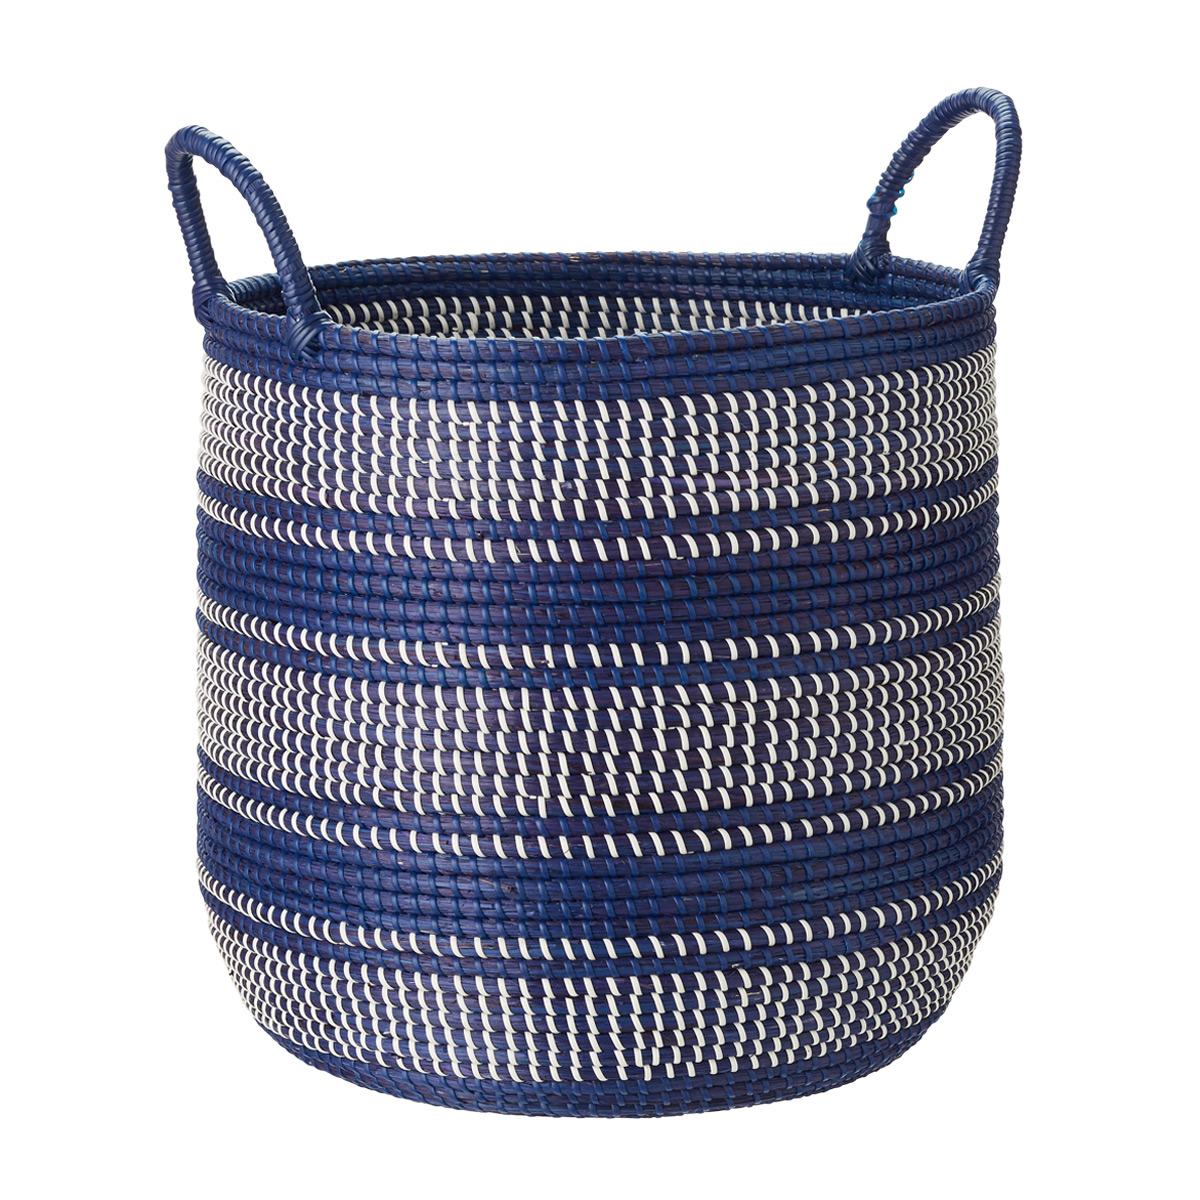 Round Seagrass Bin with Handles